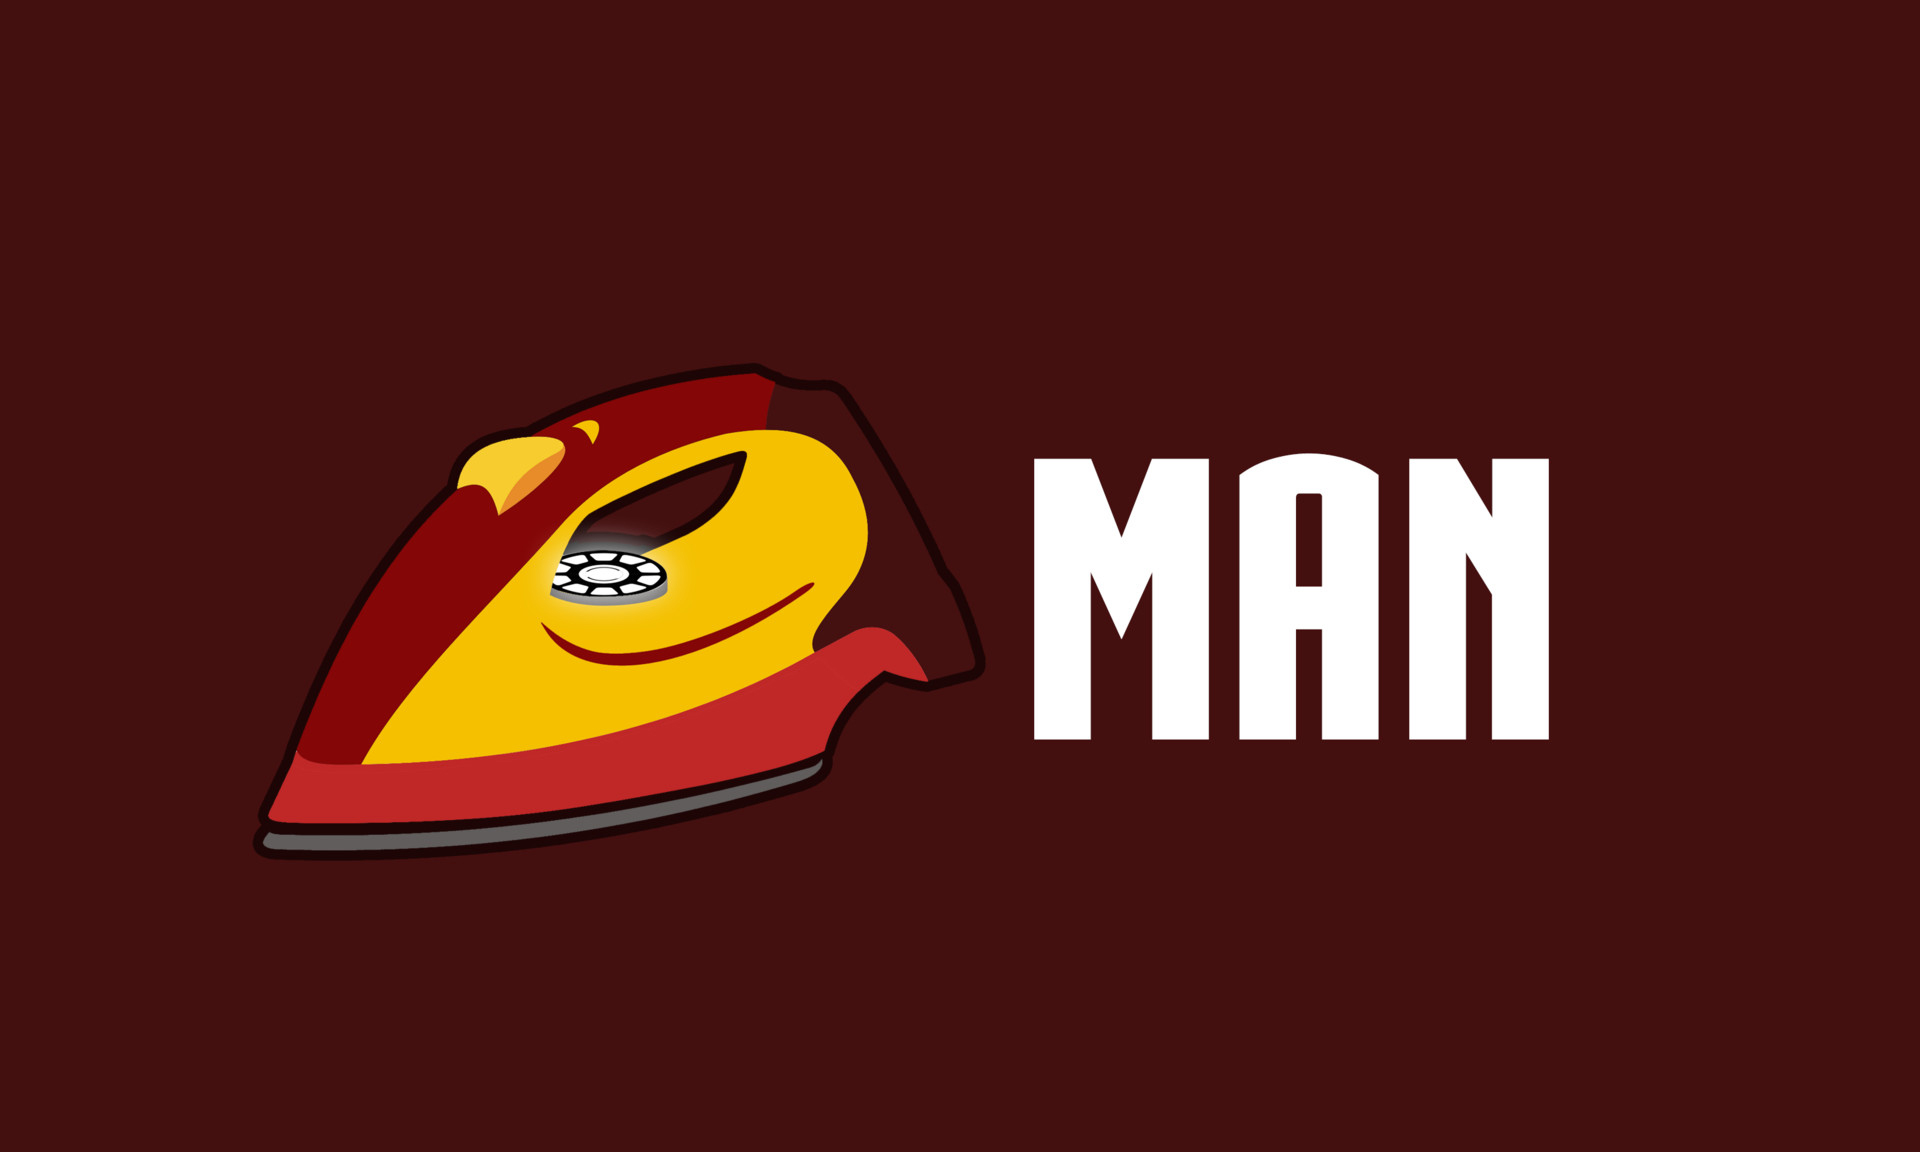 Iron Man Funny Minimalism Hd Superheroes 4k Wallpapers